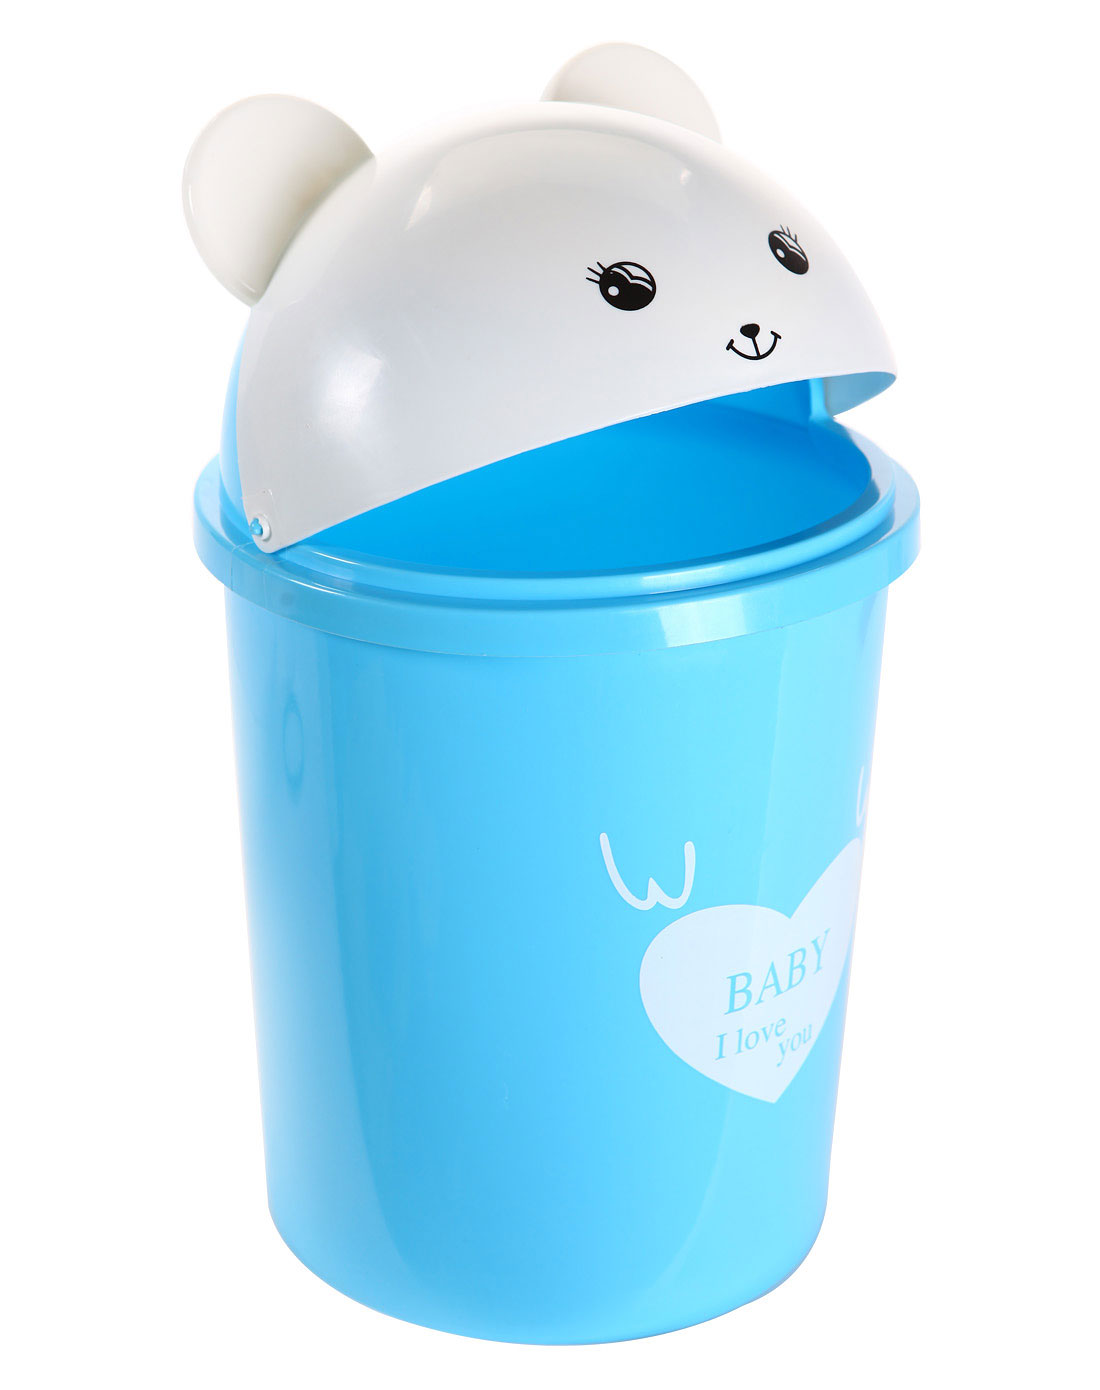 h&3家居用品专场蓝色可爱小熊塑料垃圾桶